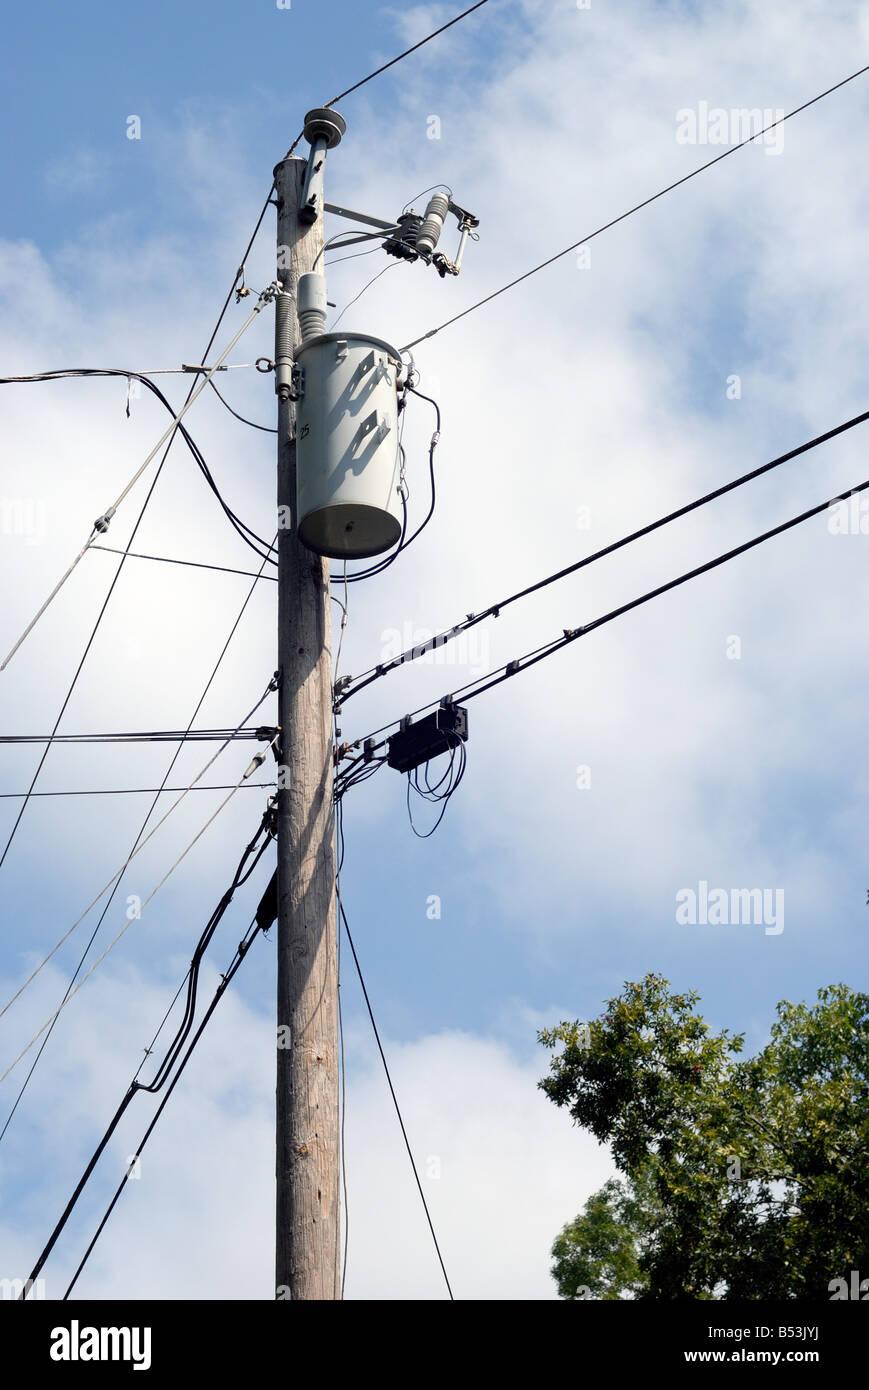 Distribution Transformer Stock Photos Usa Power Wiring Diagram Electrical On A Utility Pole Image